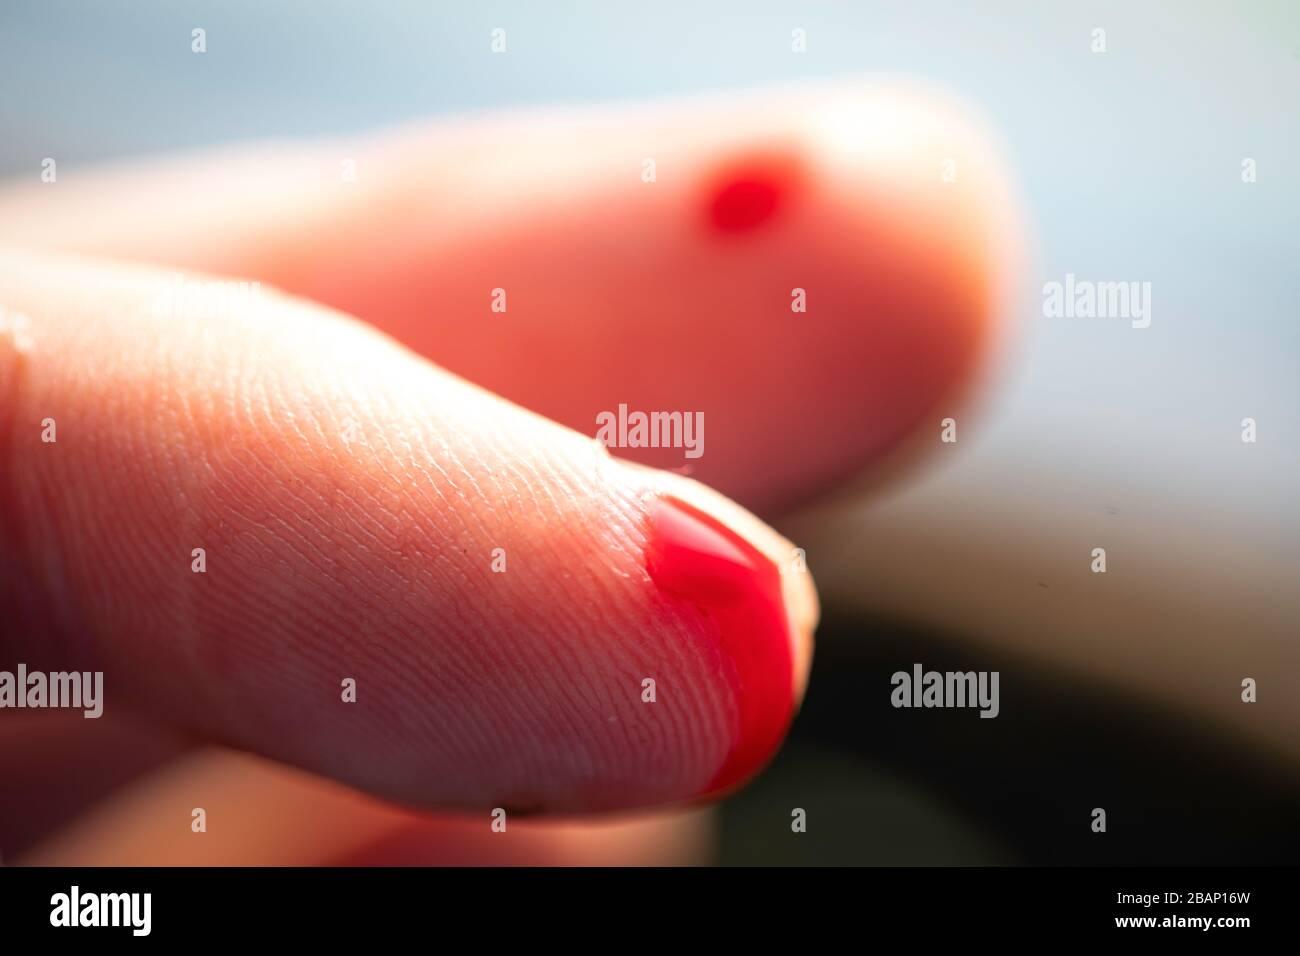 Nach fingerkuppe abgeschnitten wächst Monstera: nach